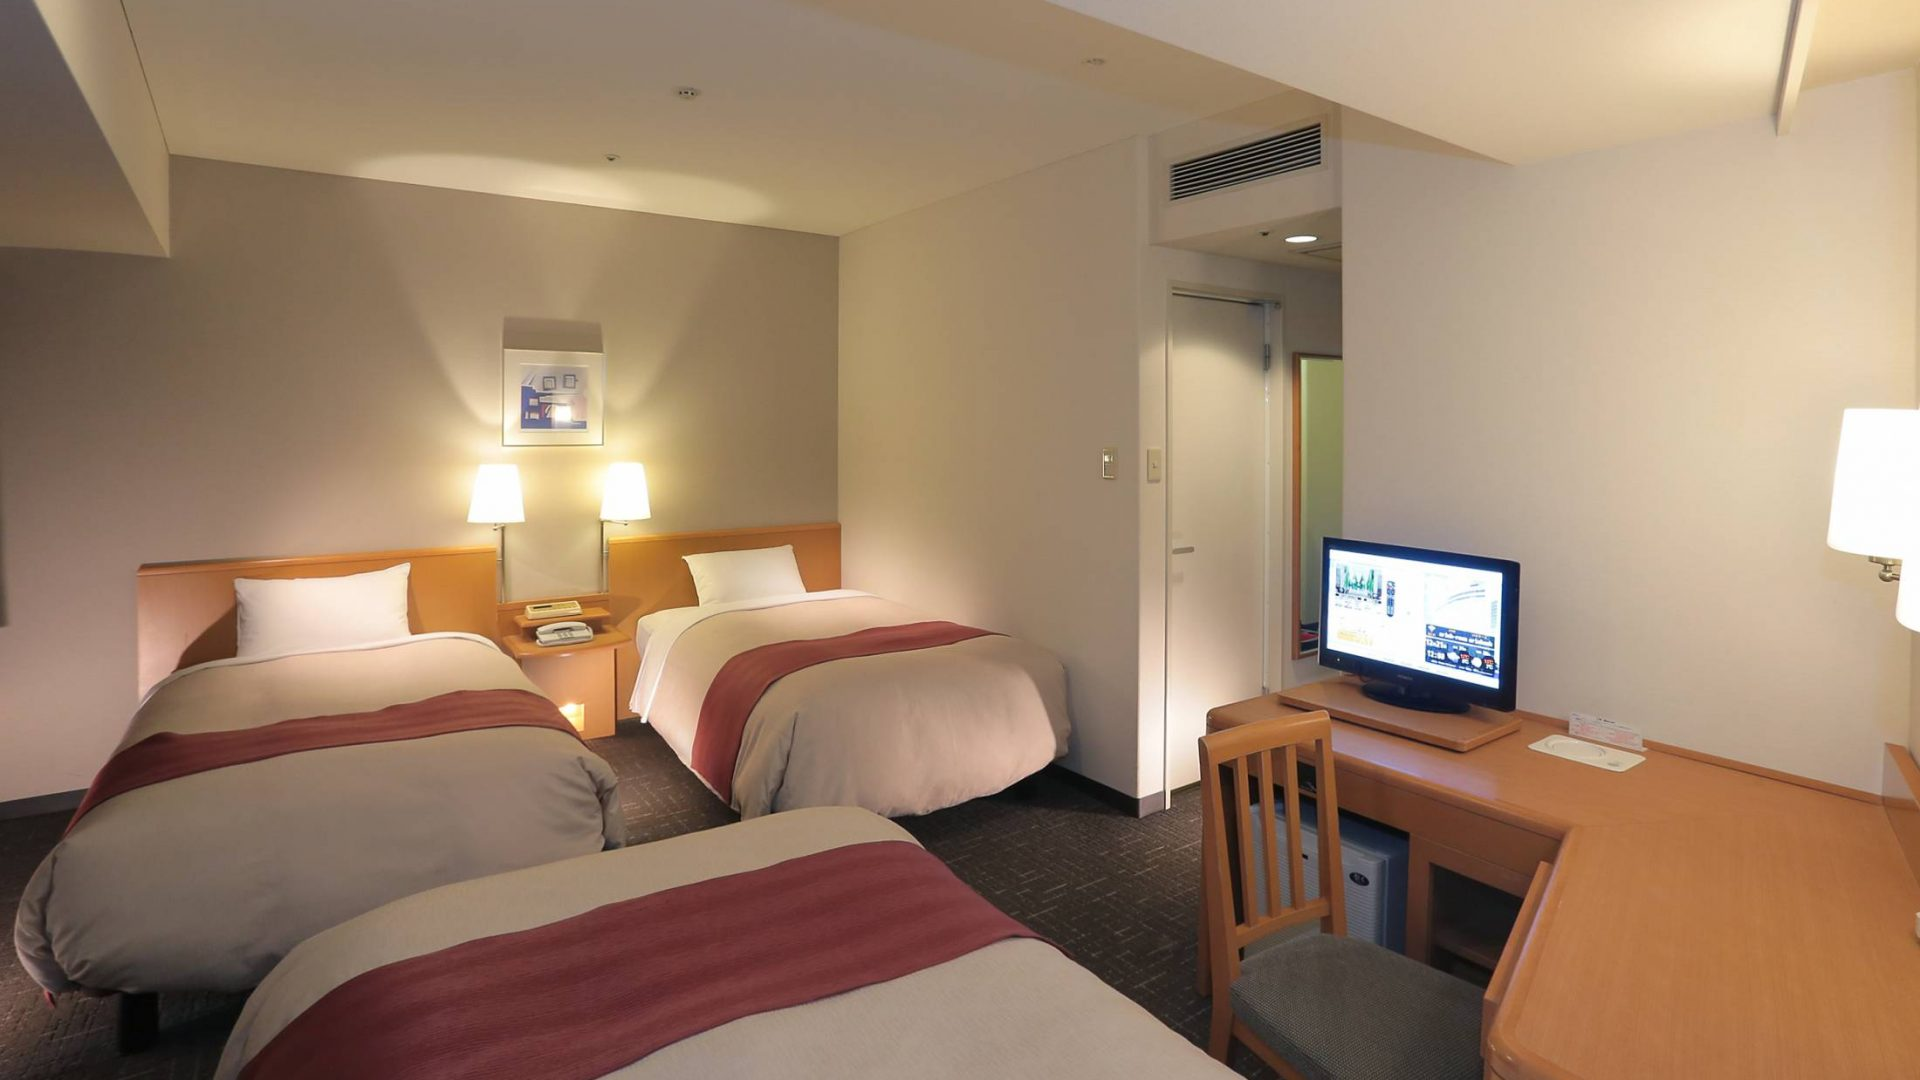 guest rooms tokyo bay ariake washington hotel tokyo - Galley Hotel Decorating